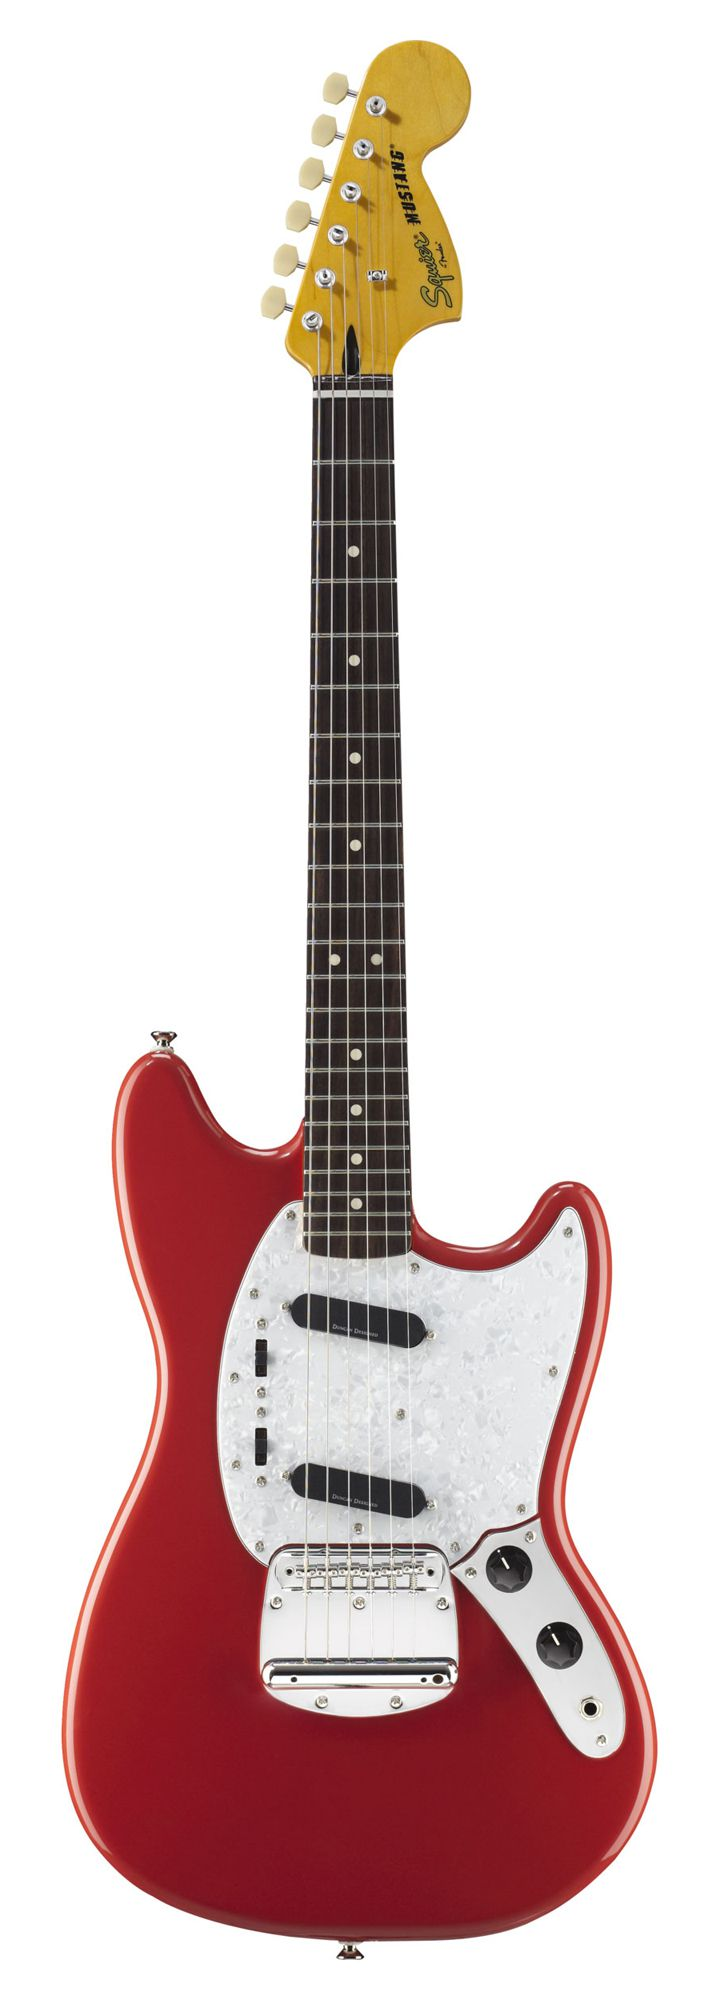 Squier Vintage Modified Mustang - Fiesta Red